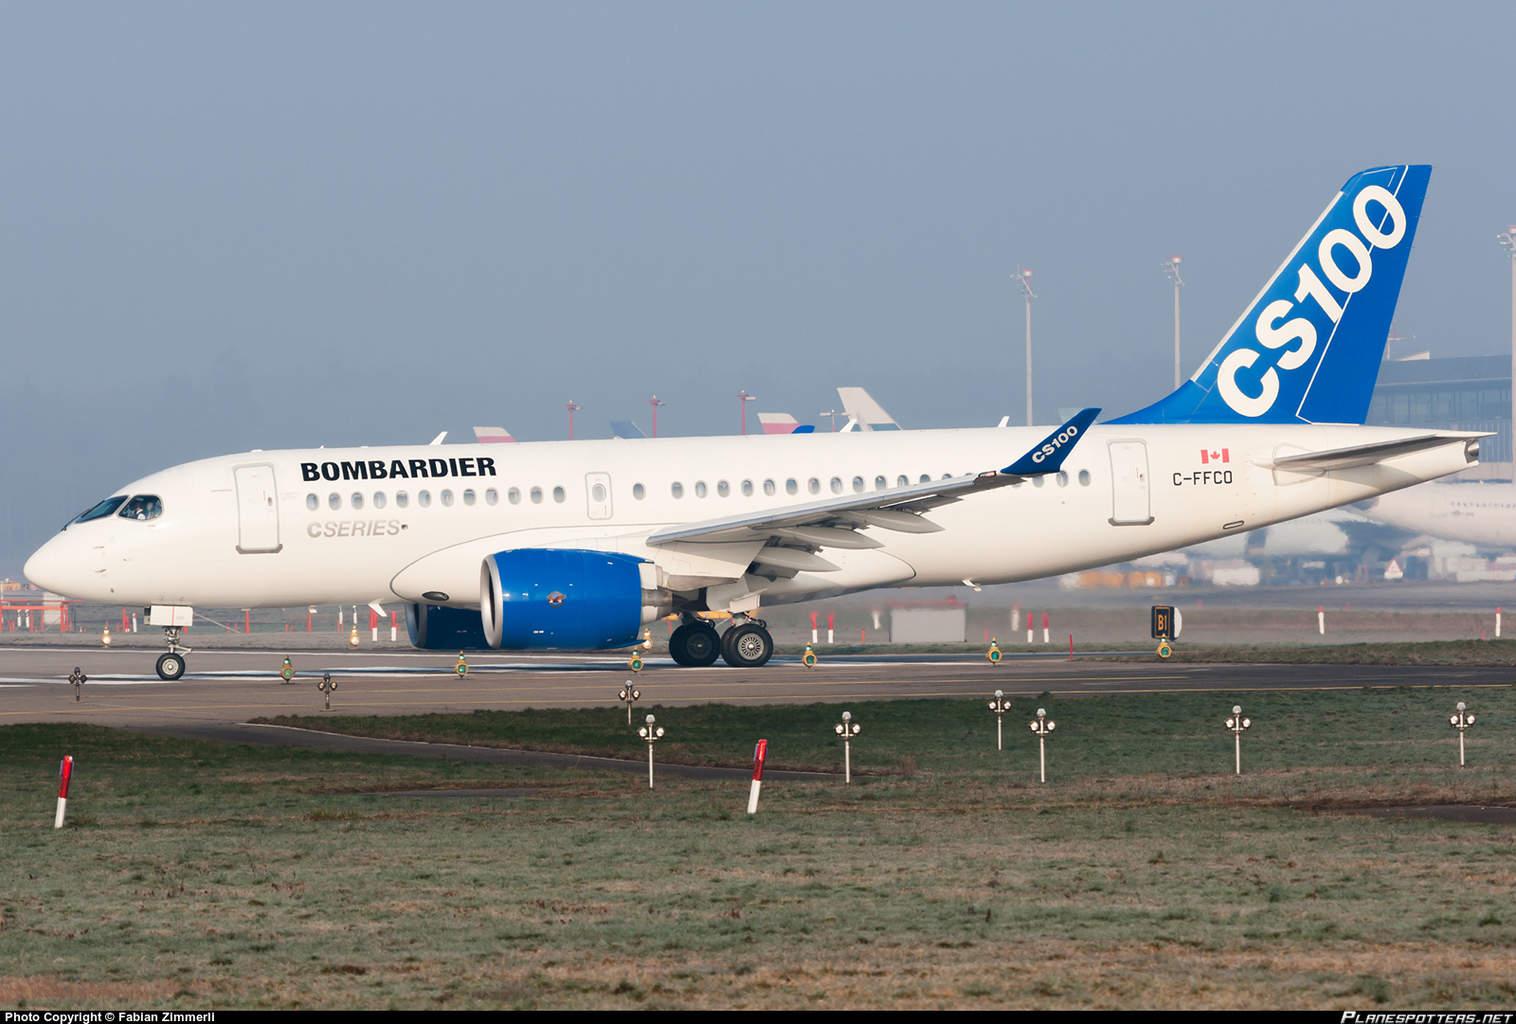 Spirit looking into Bombardier CSeries